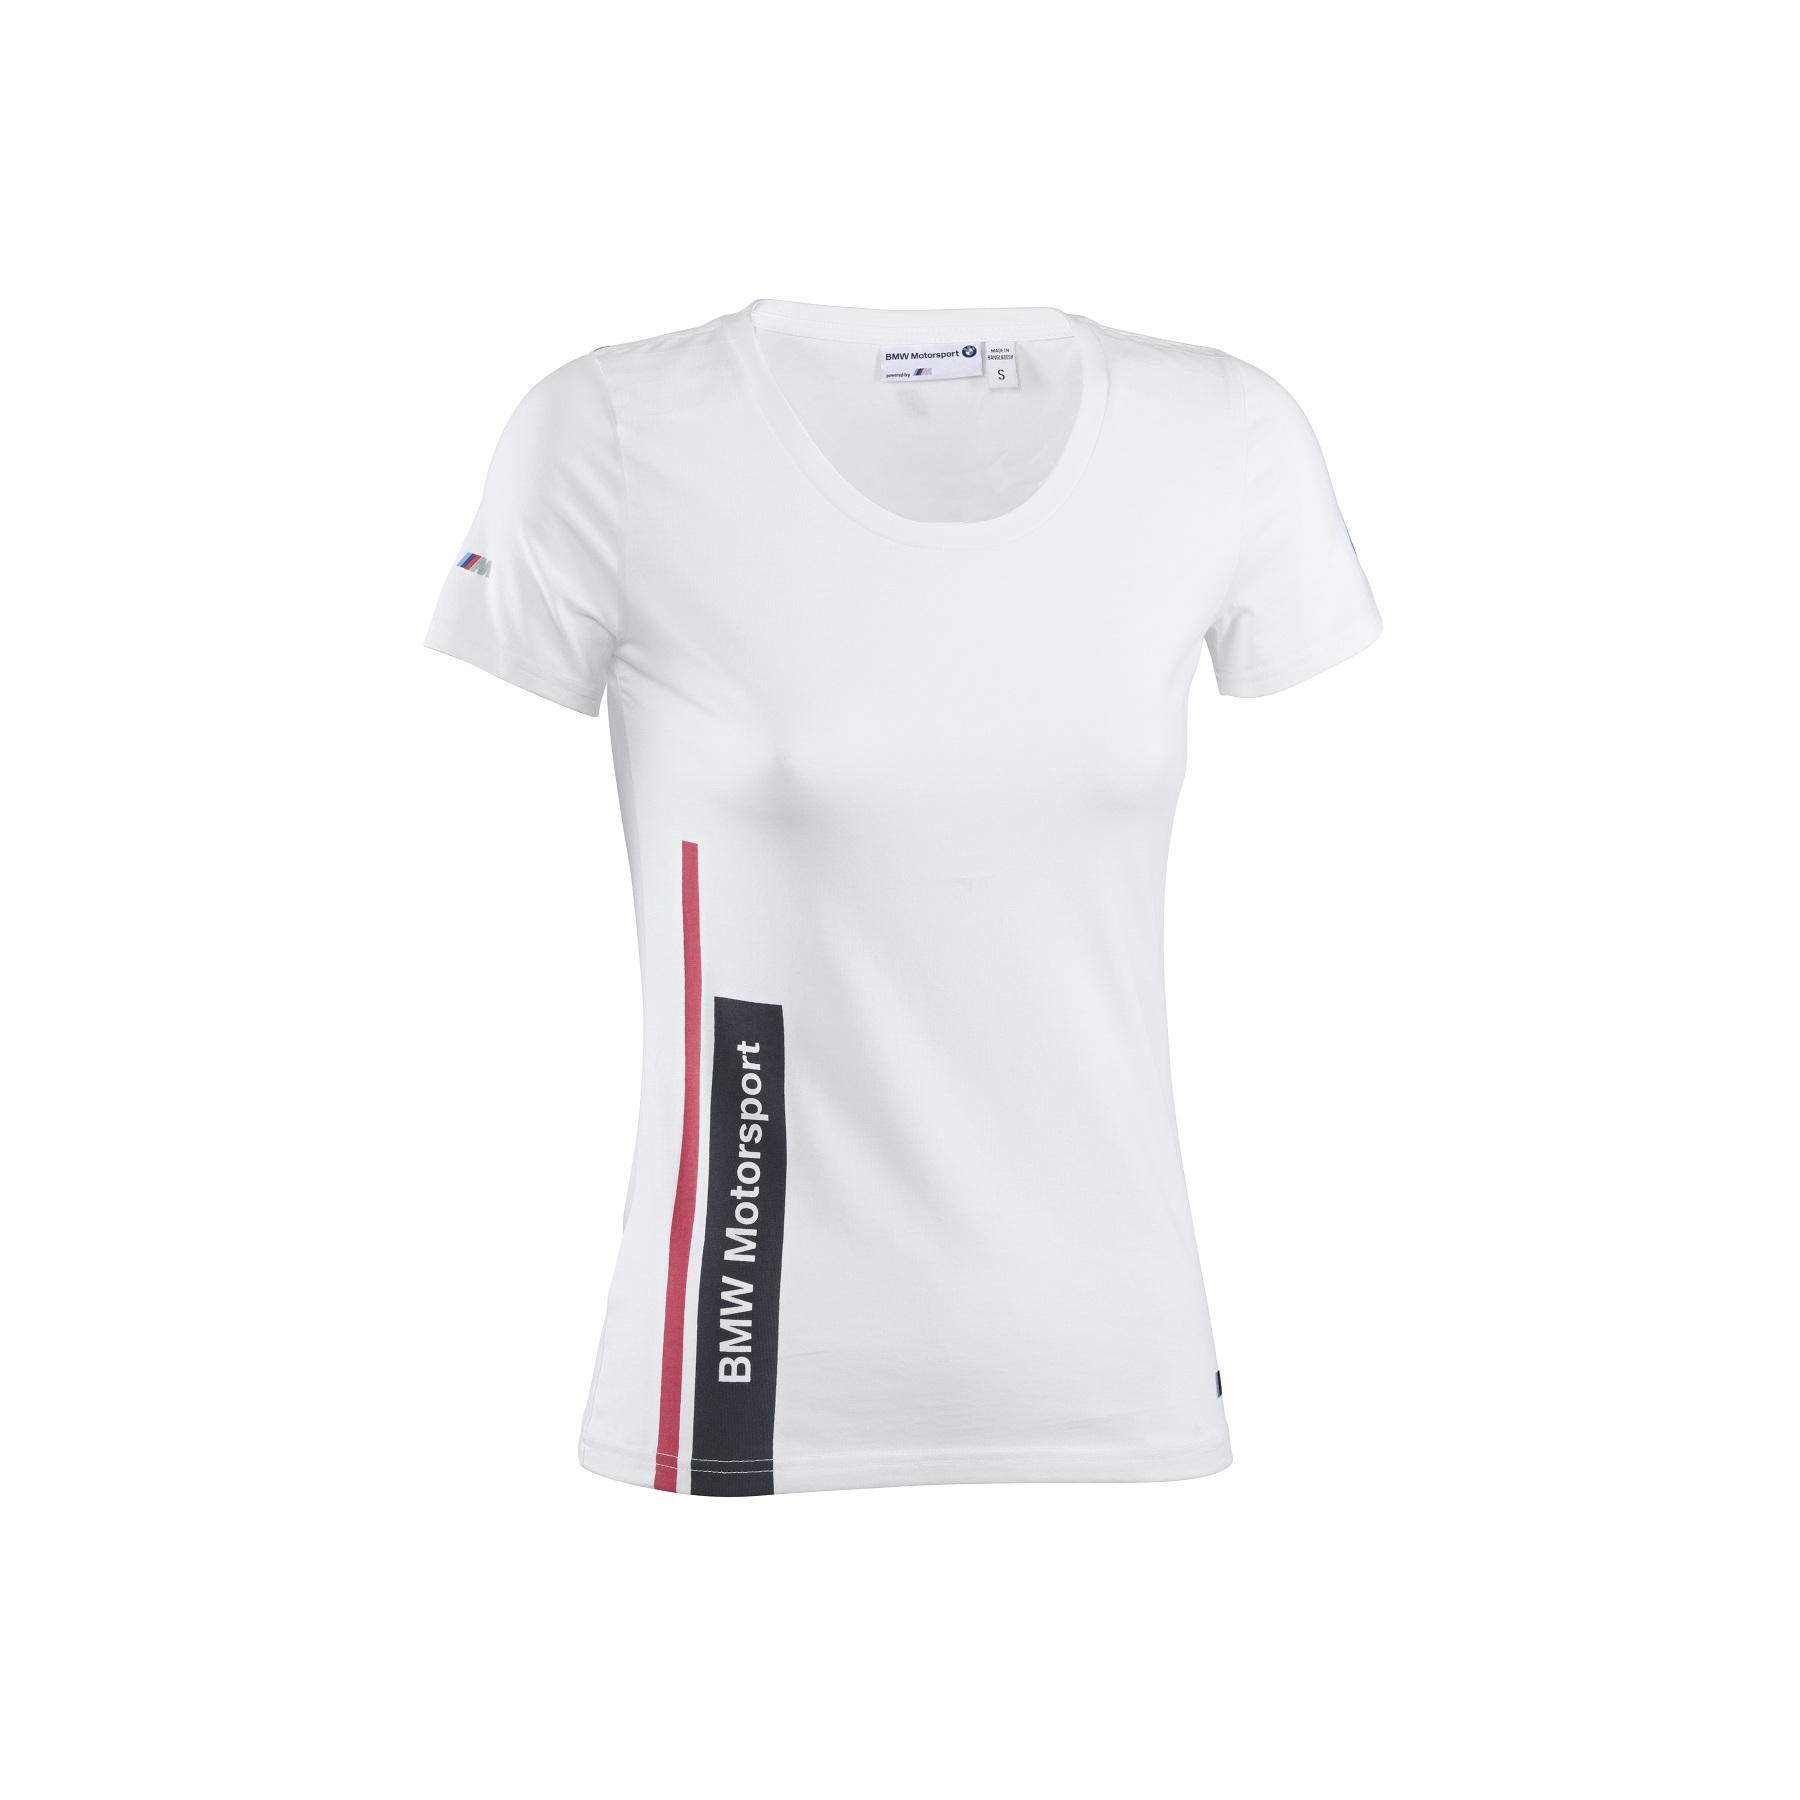 new puma bmw motorsport m sport womens t shirt white. Black Bedroom Furniture Sets. Home Design Ideas